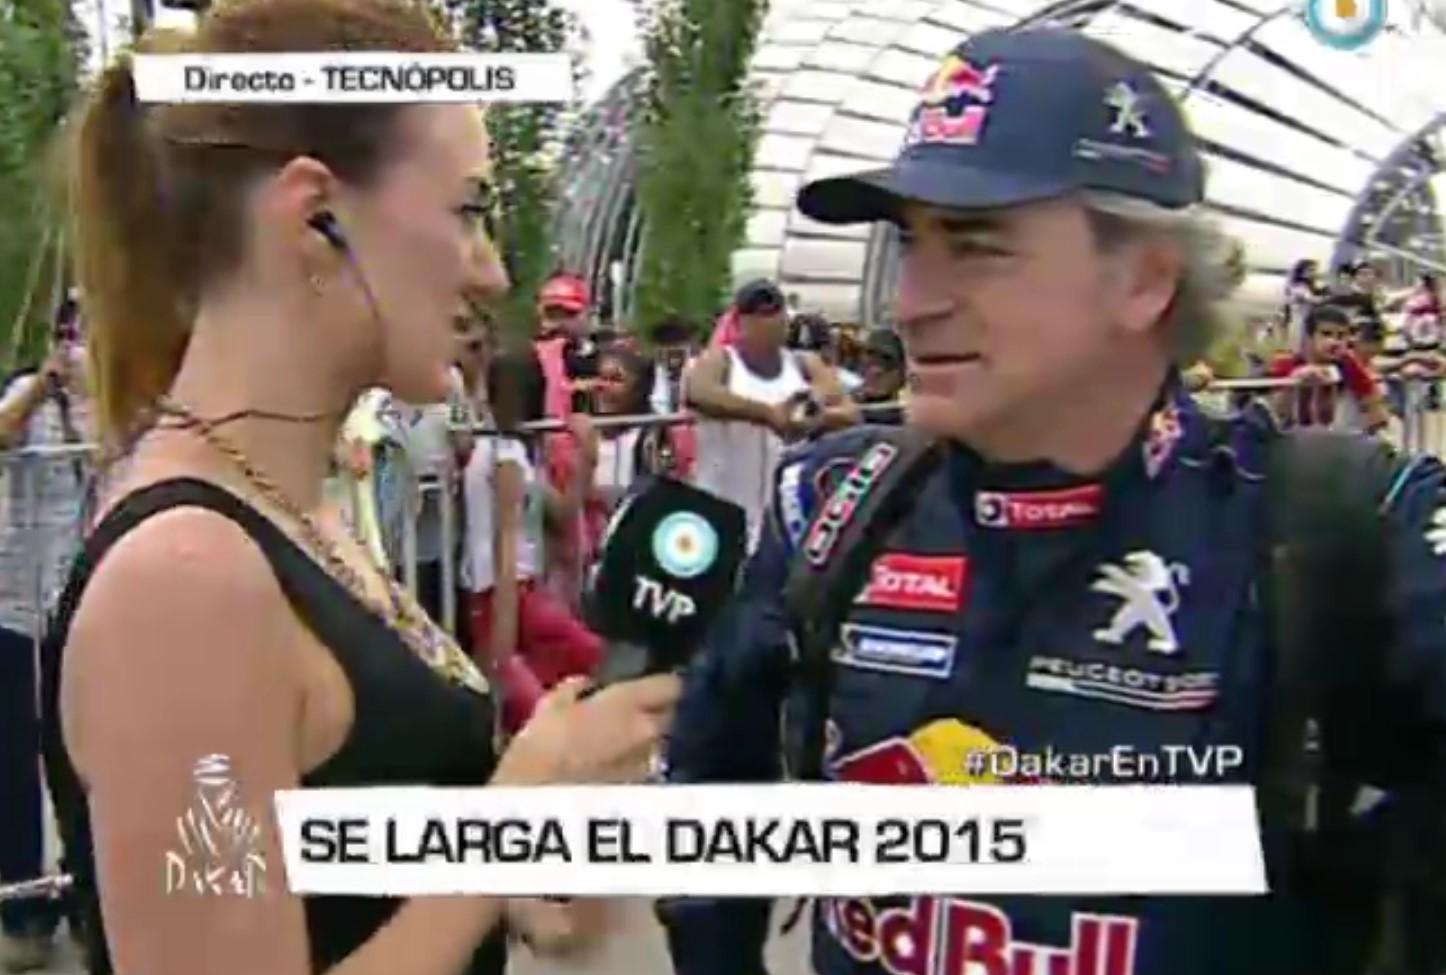 2015 Rallye Raid Dakar Argentina - Bolivia - Chile [4-17 Enero] - Página 6 B6cxLZJCIAIuYpV